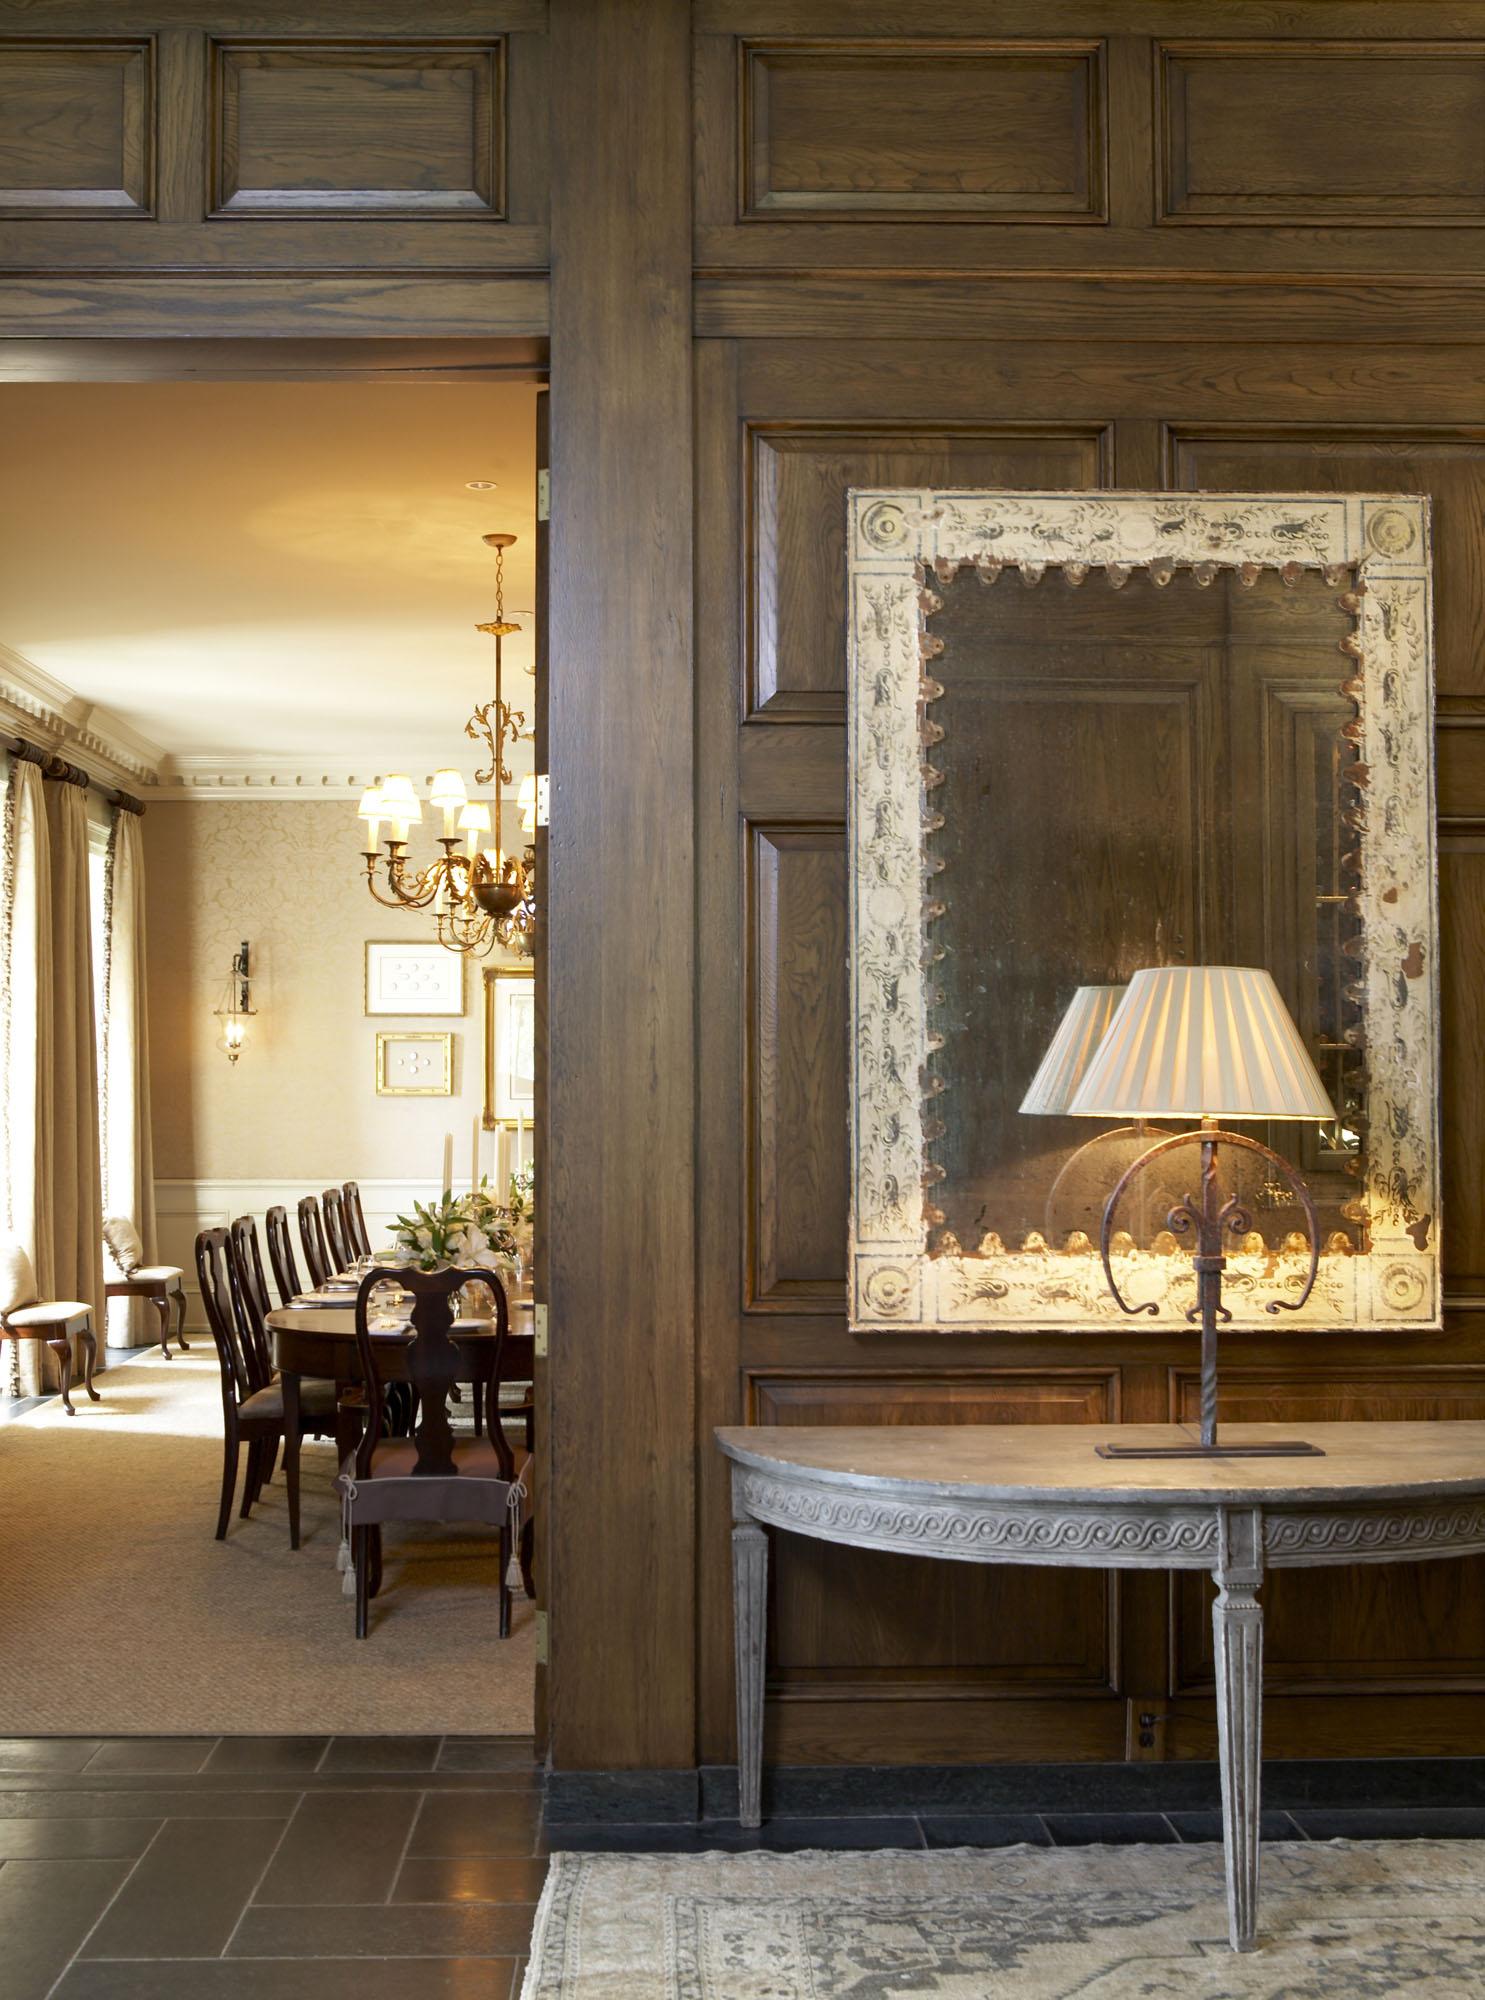 Country club interior design